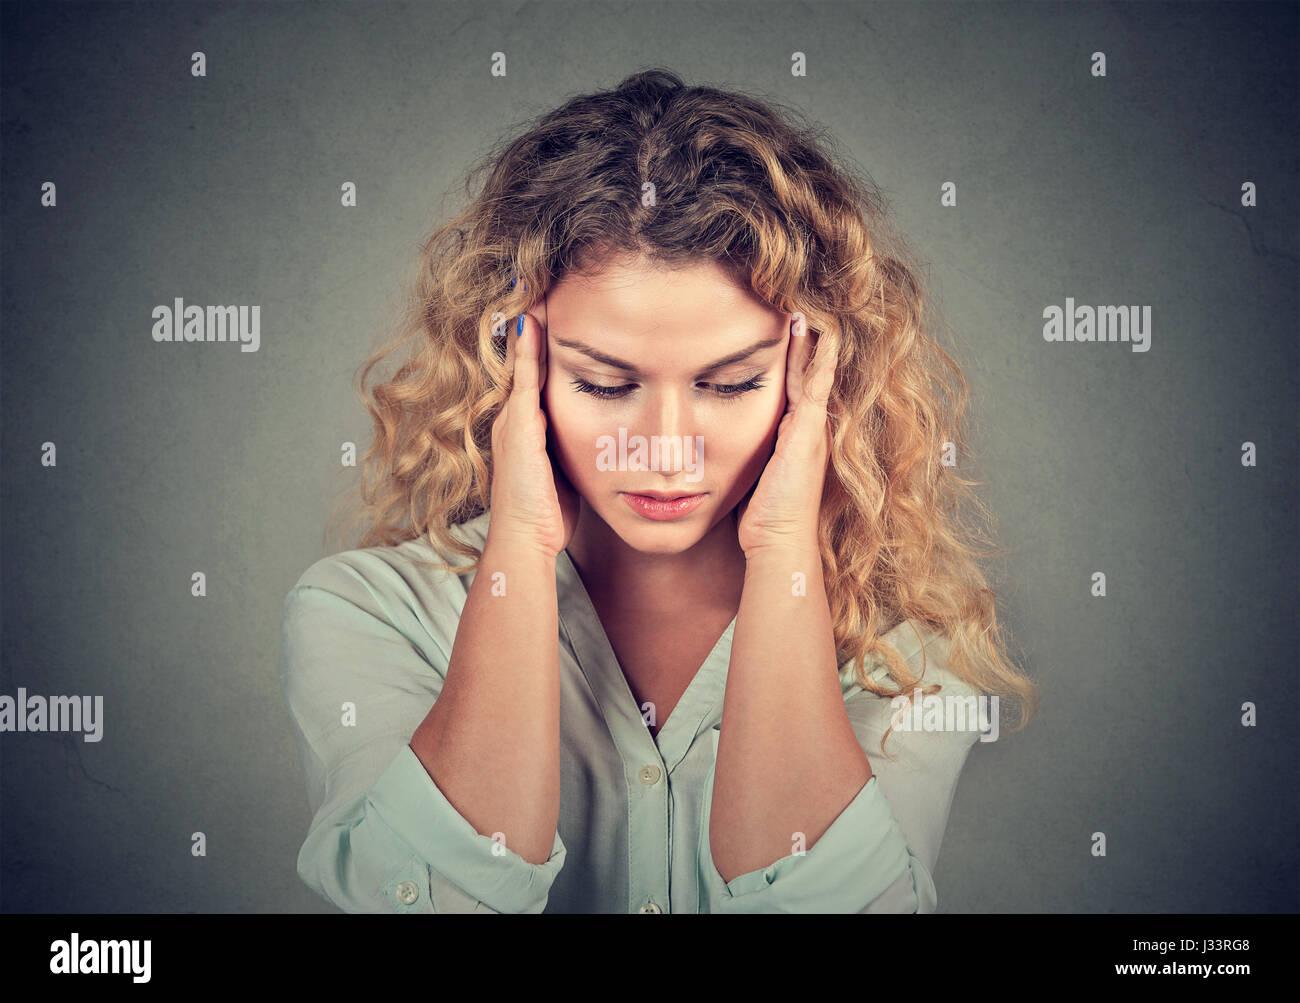 Closeup retrato triste hermosa mujer joven con expresión de cara destacó preocupados mirando hacia abajo Imagen De Stock